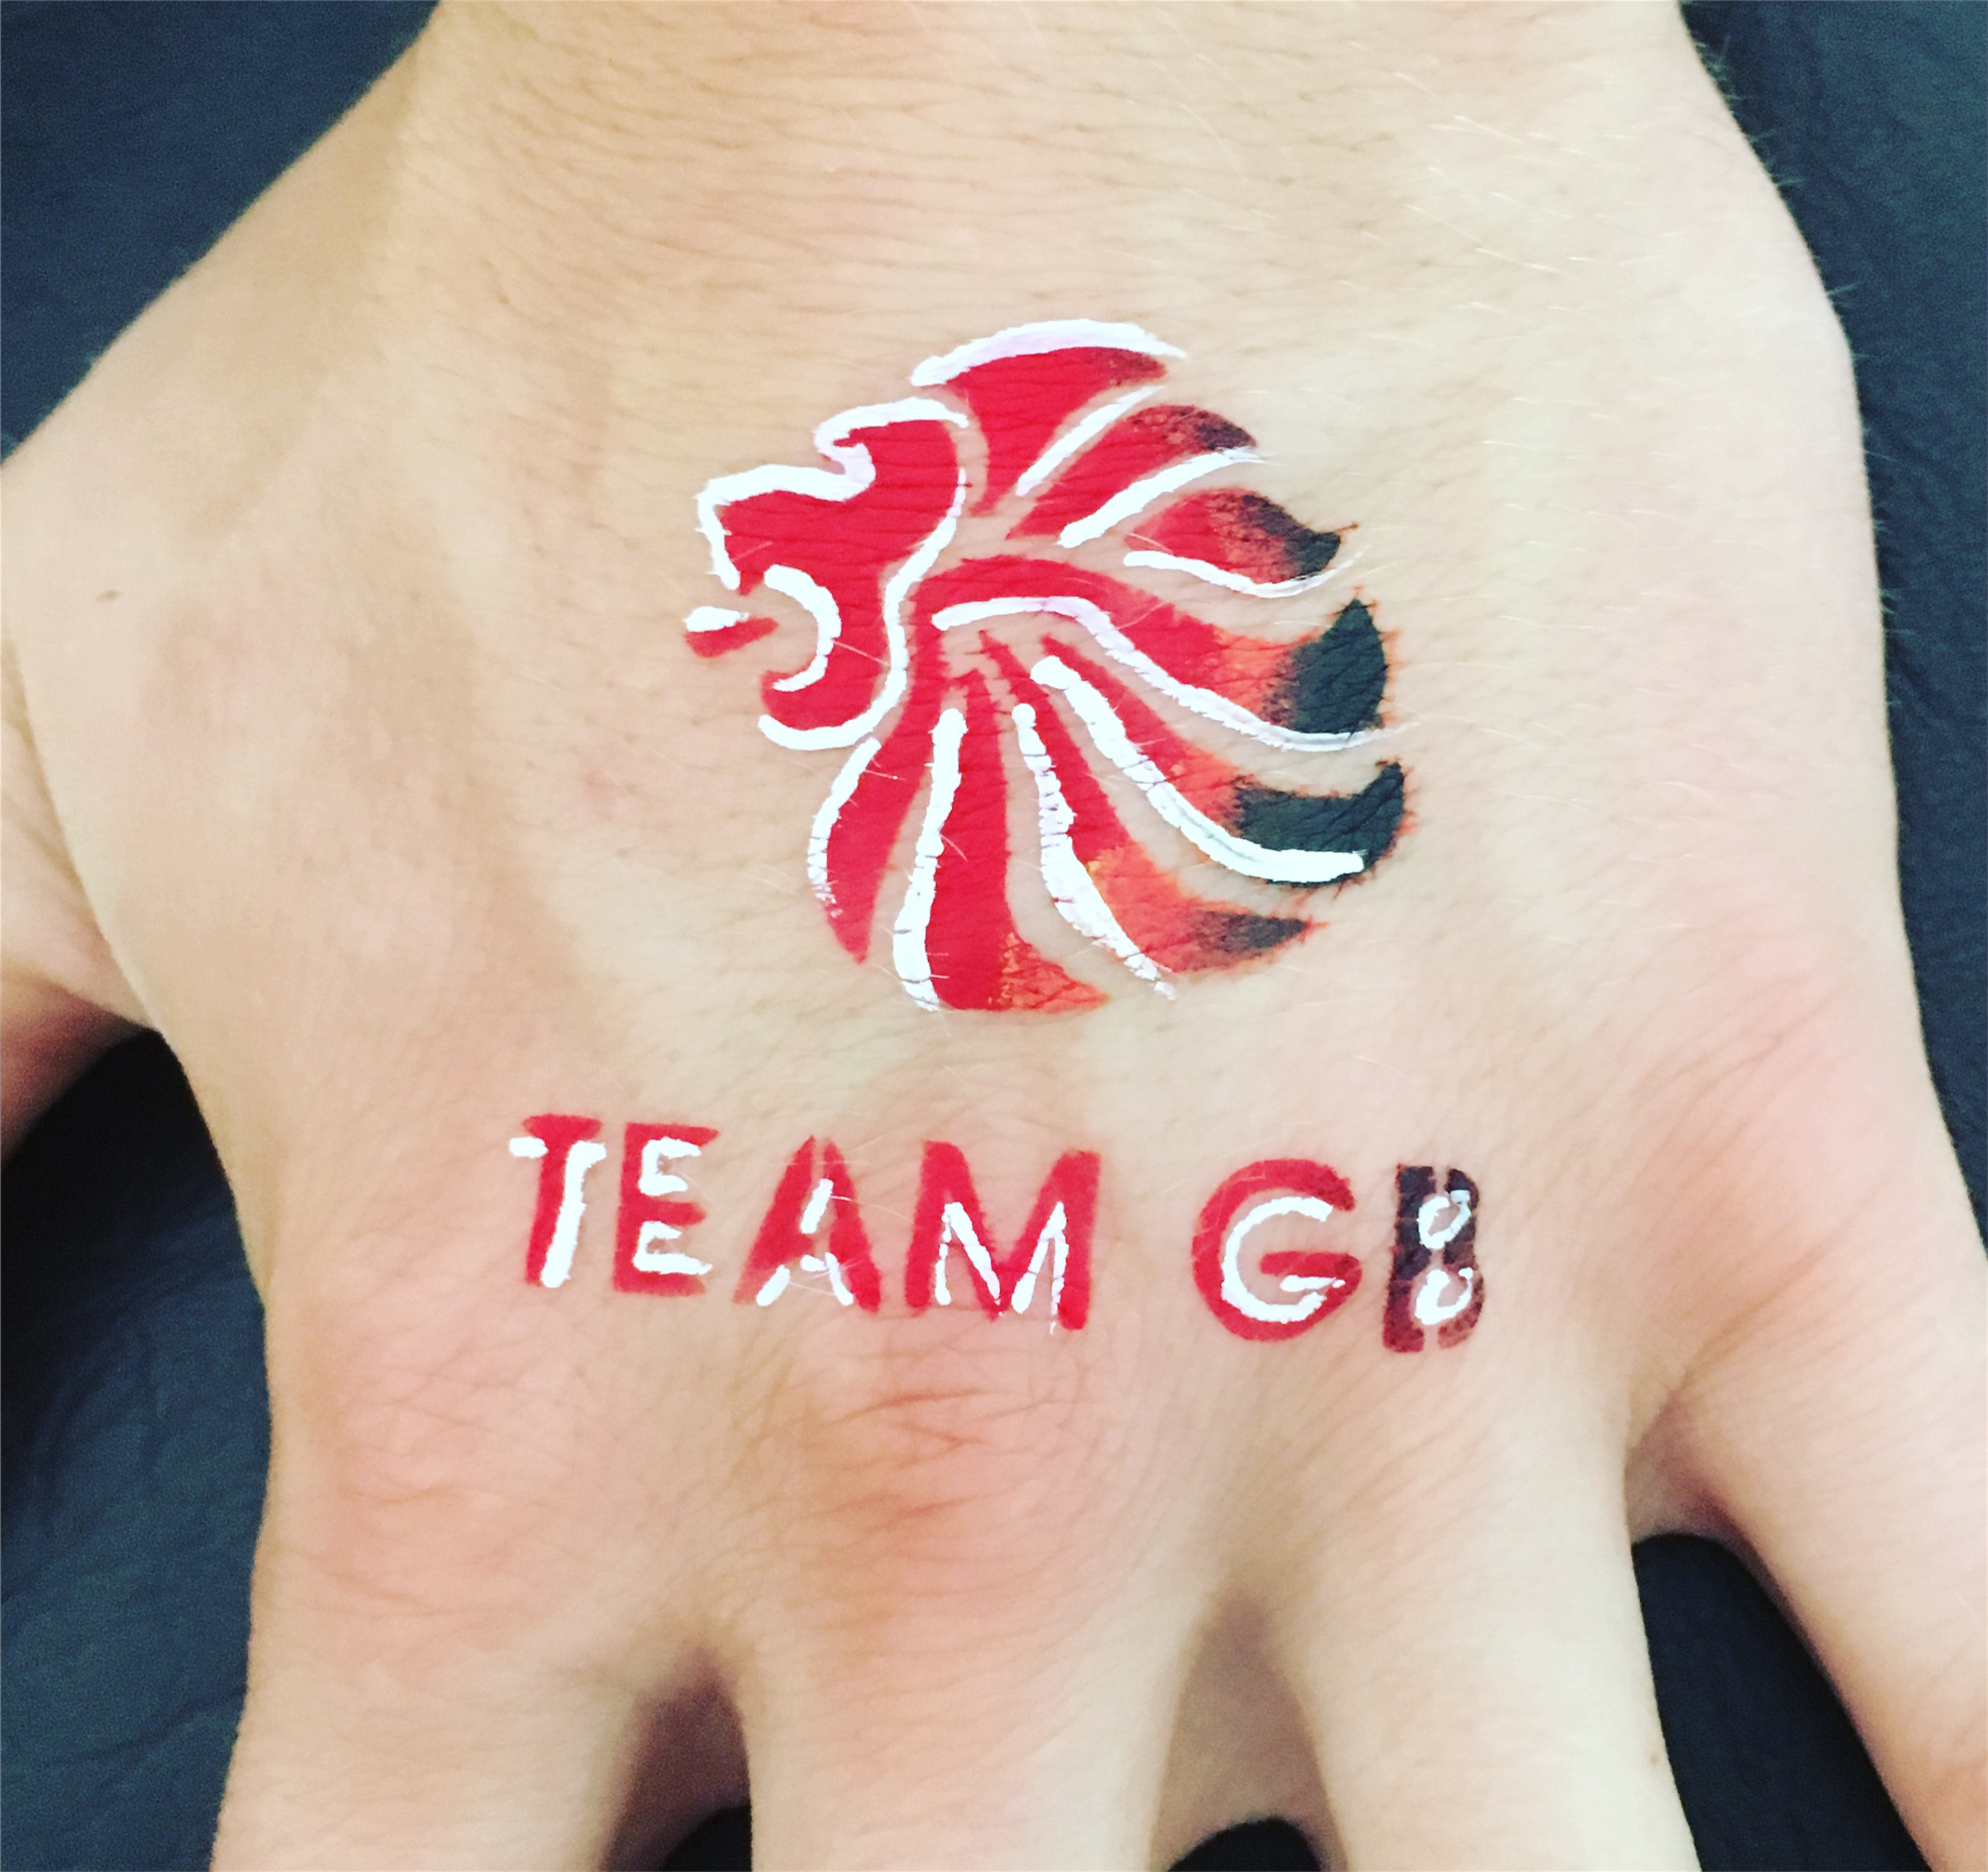 Team GB hand paint